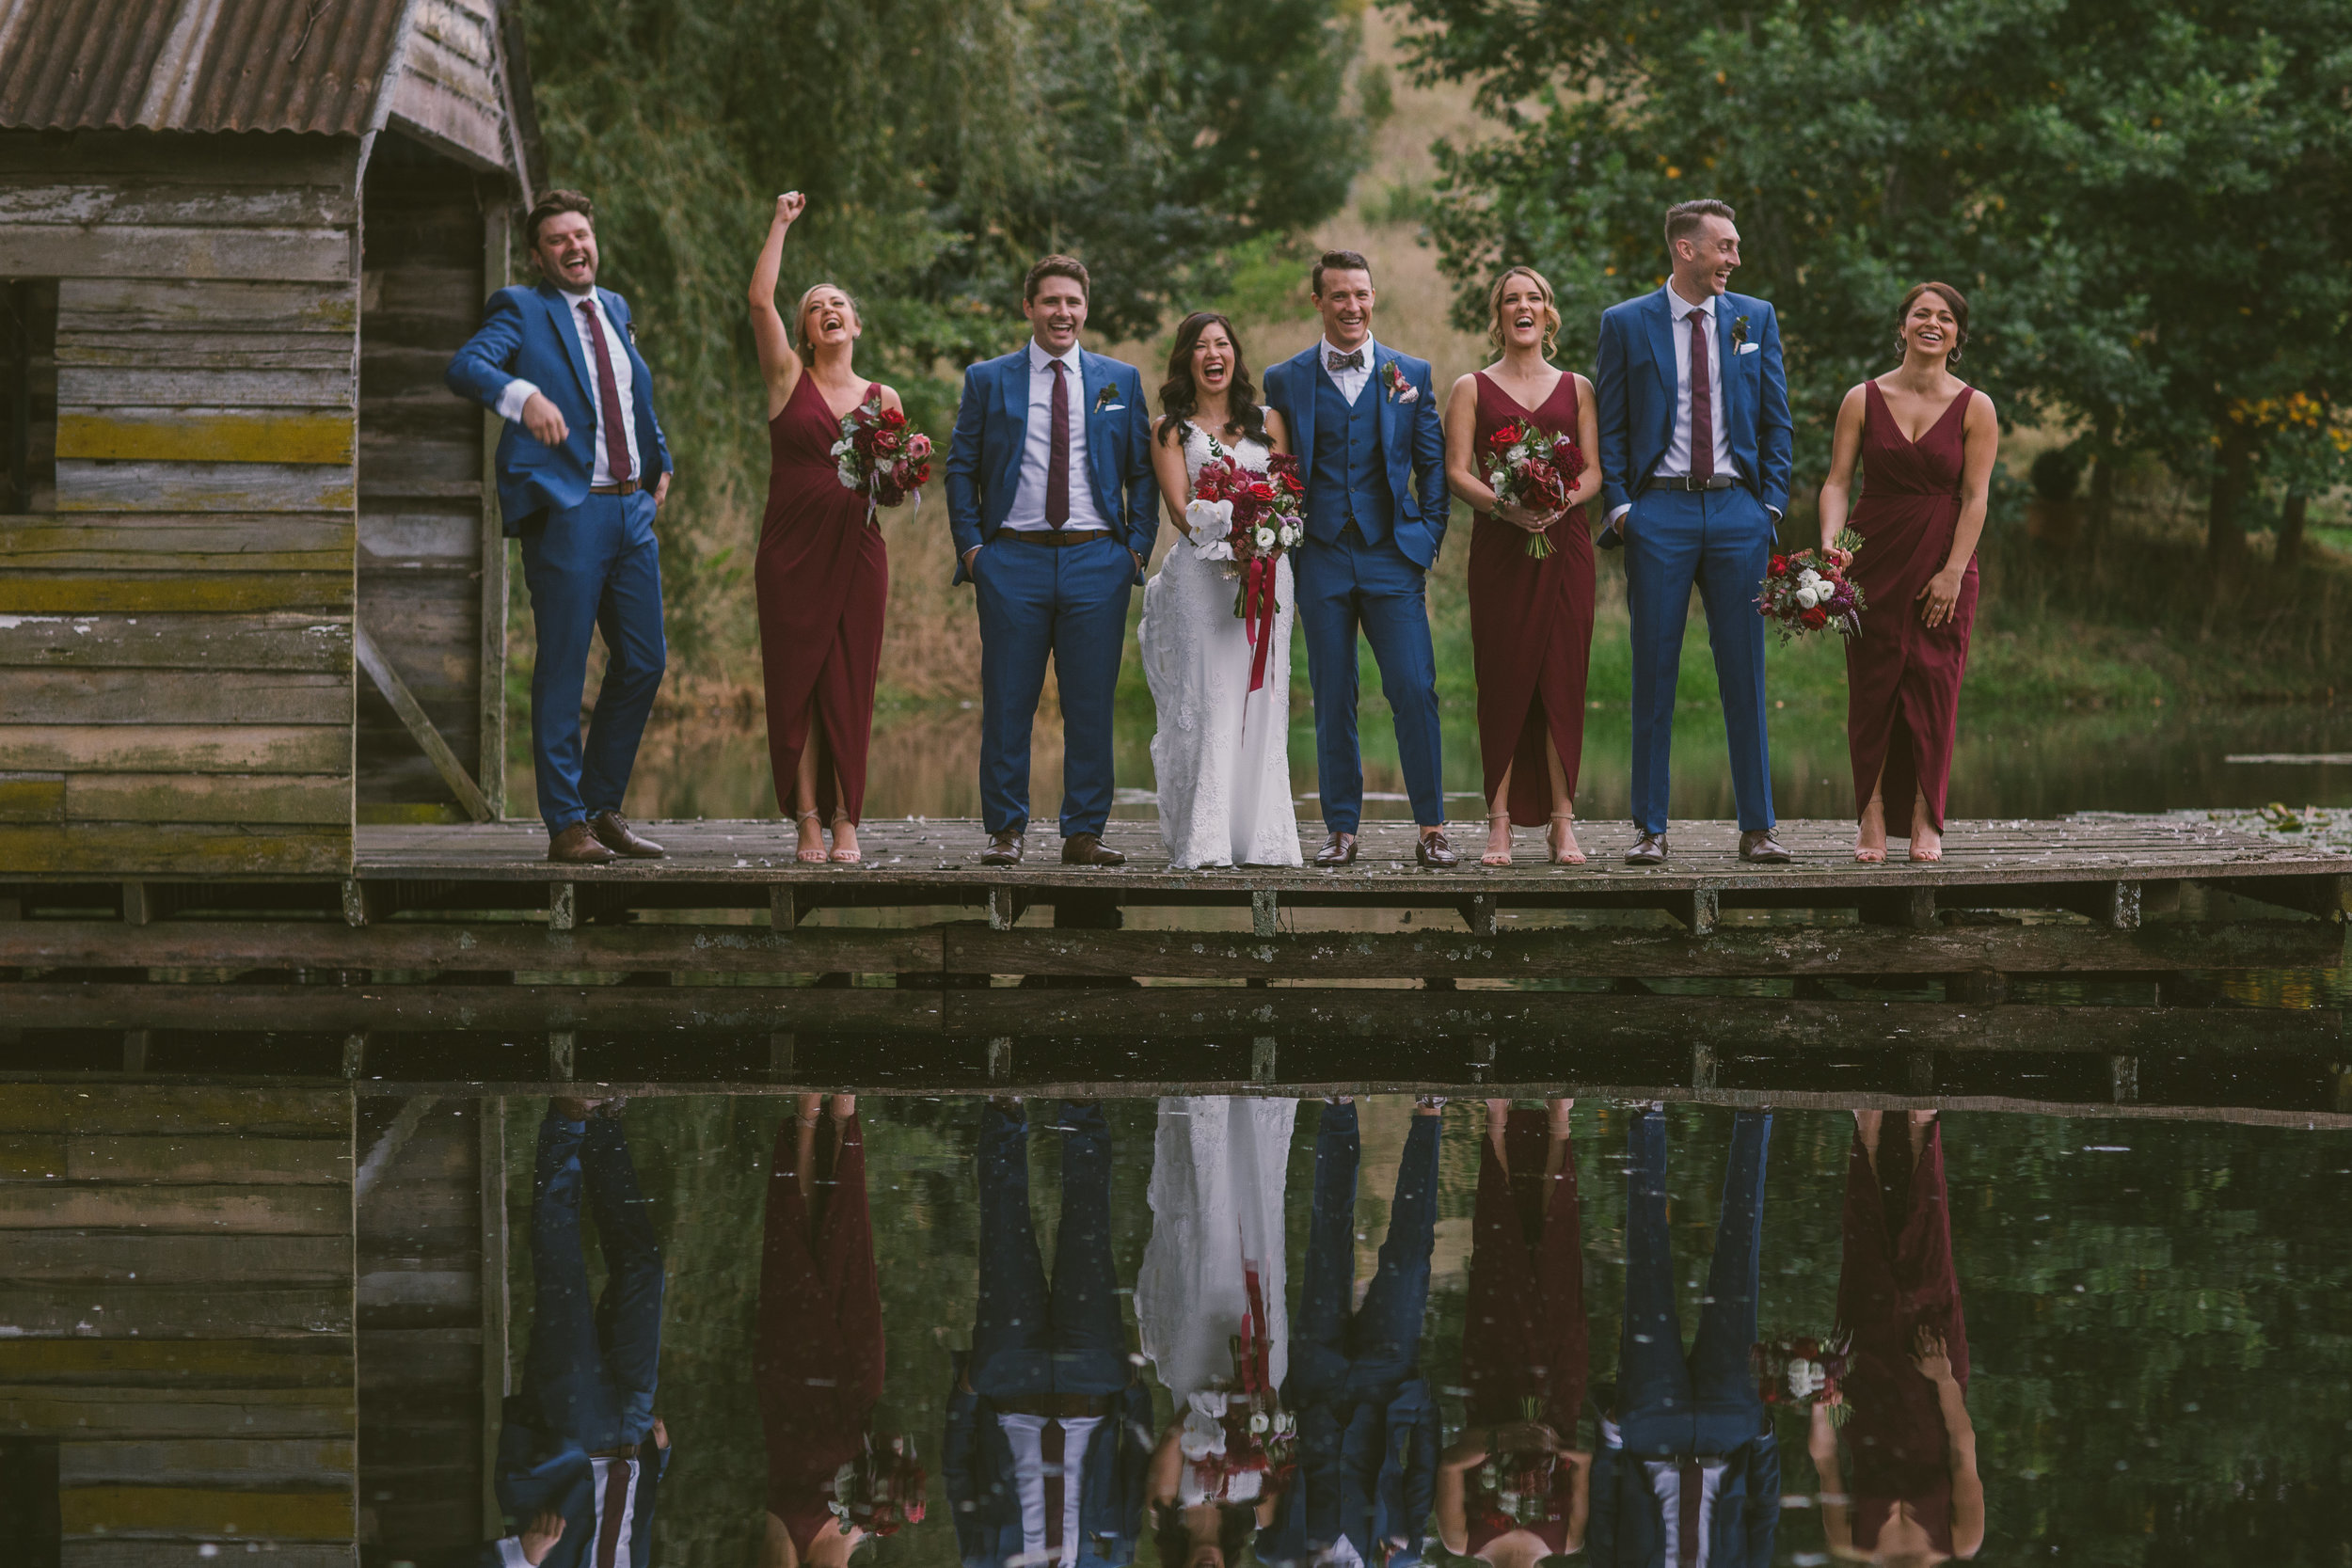 Sarah + Jason - Mali Brae Farm Wedding Photographer - Magnus Agren Photography-0467.jpg